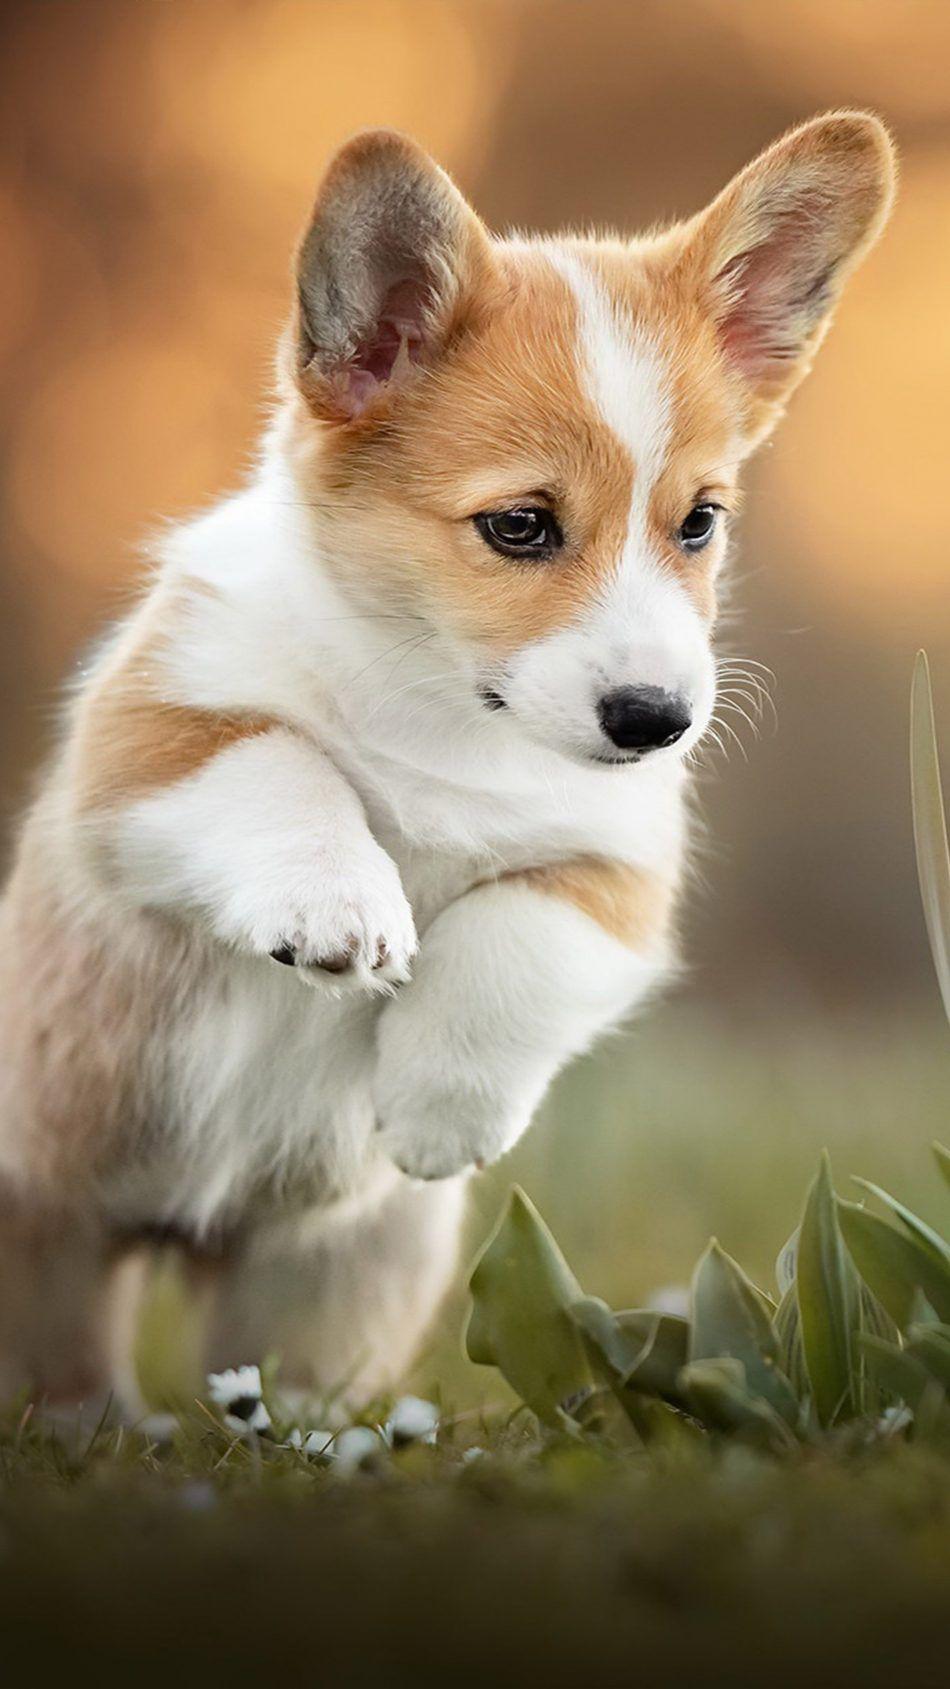 Corgi Puppy Pet Dog Corgi Puppy Cute Dog Wallpaper